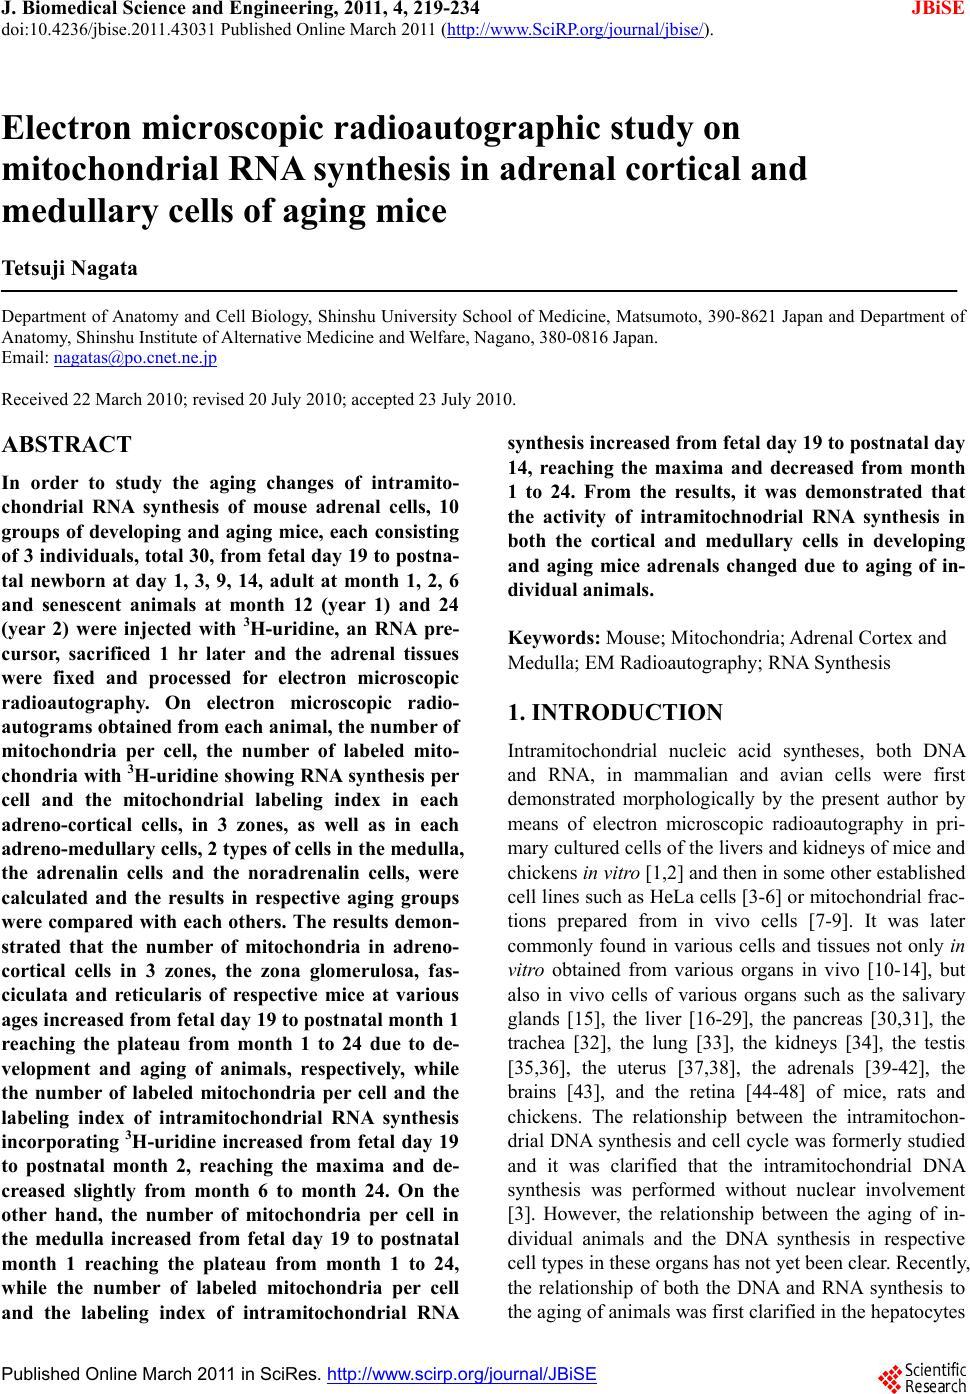 Electron microscopic radioautographic study on mitochondrial RNA ...